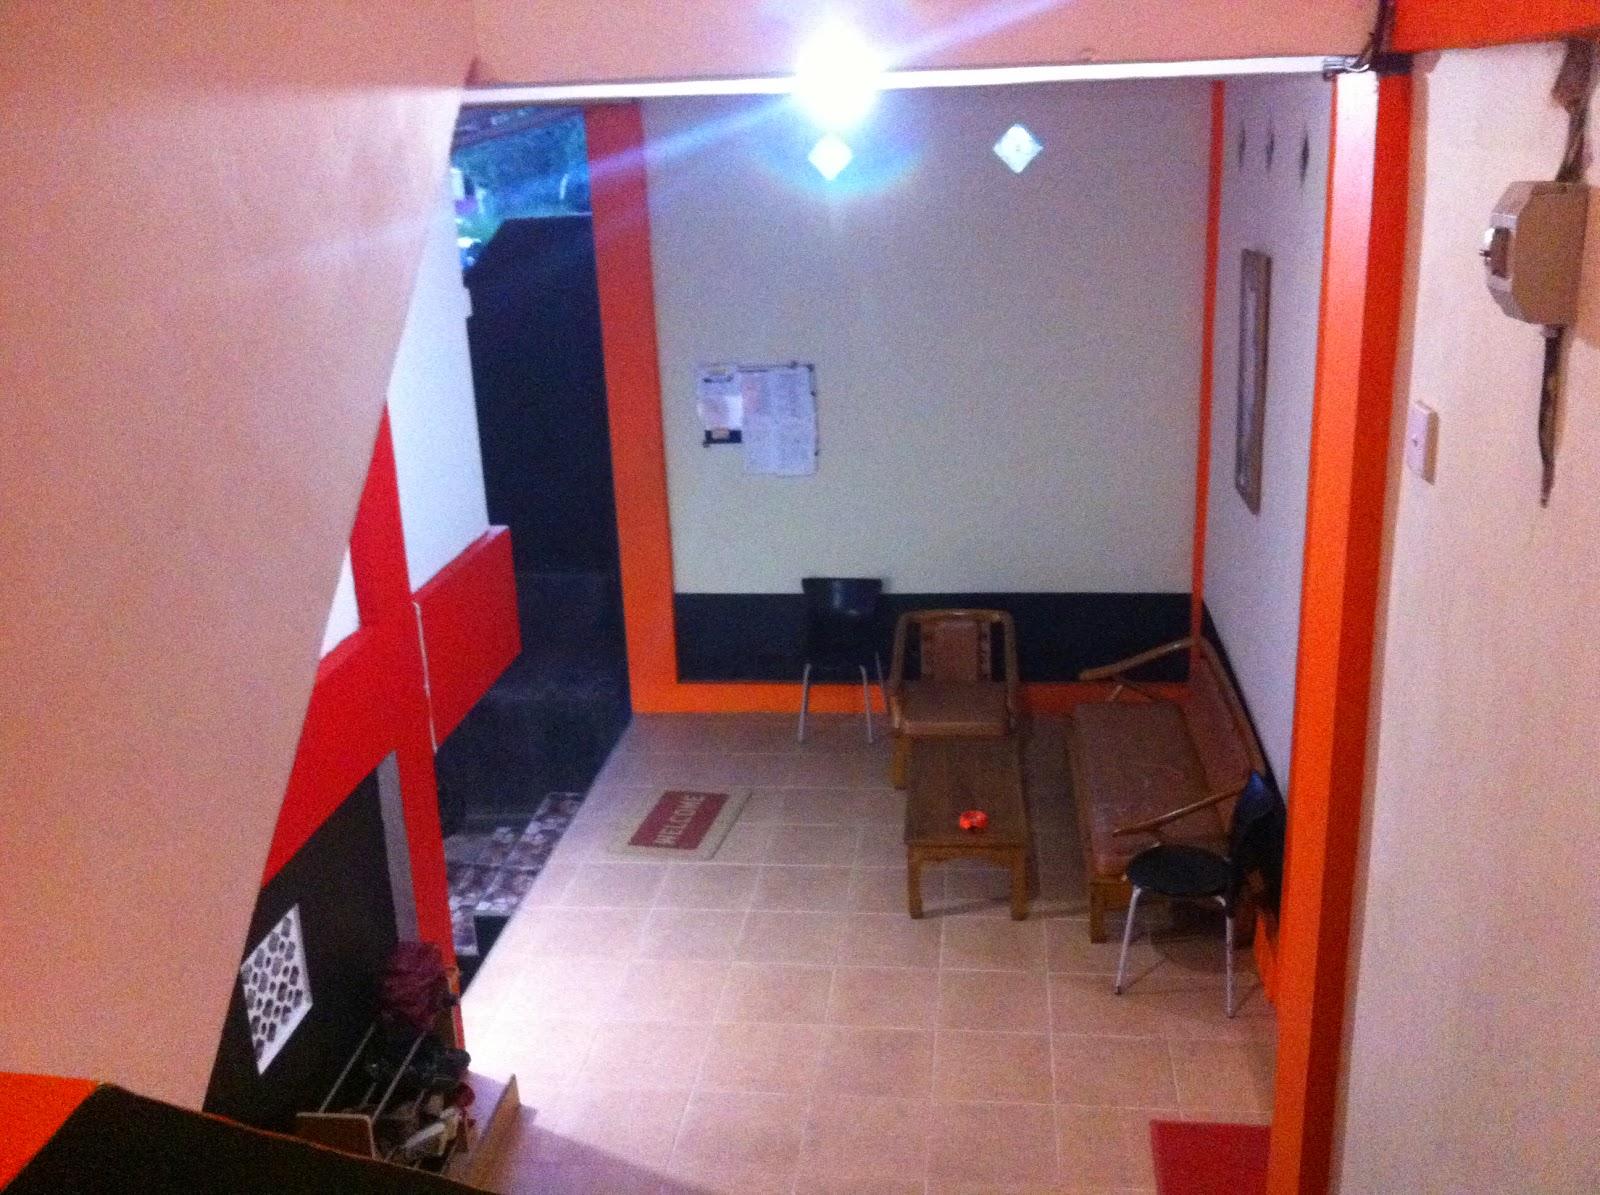 HOTEL HOMESTAY MURAH DEKAT BANDARA DOME PDAM KNPI BALIKPAPAN